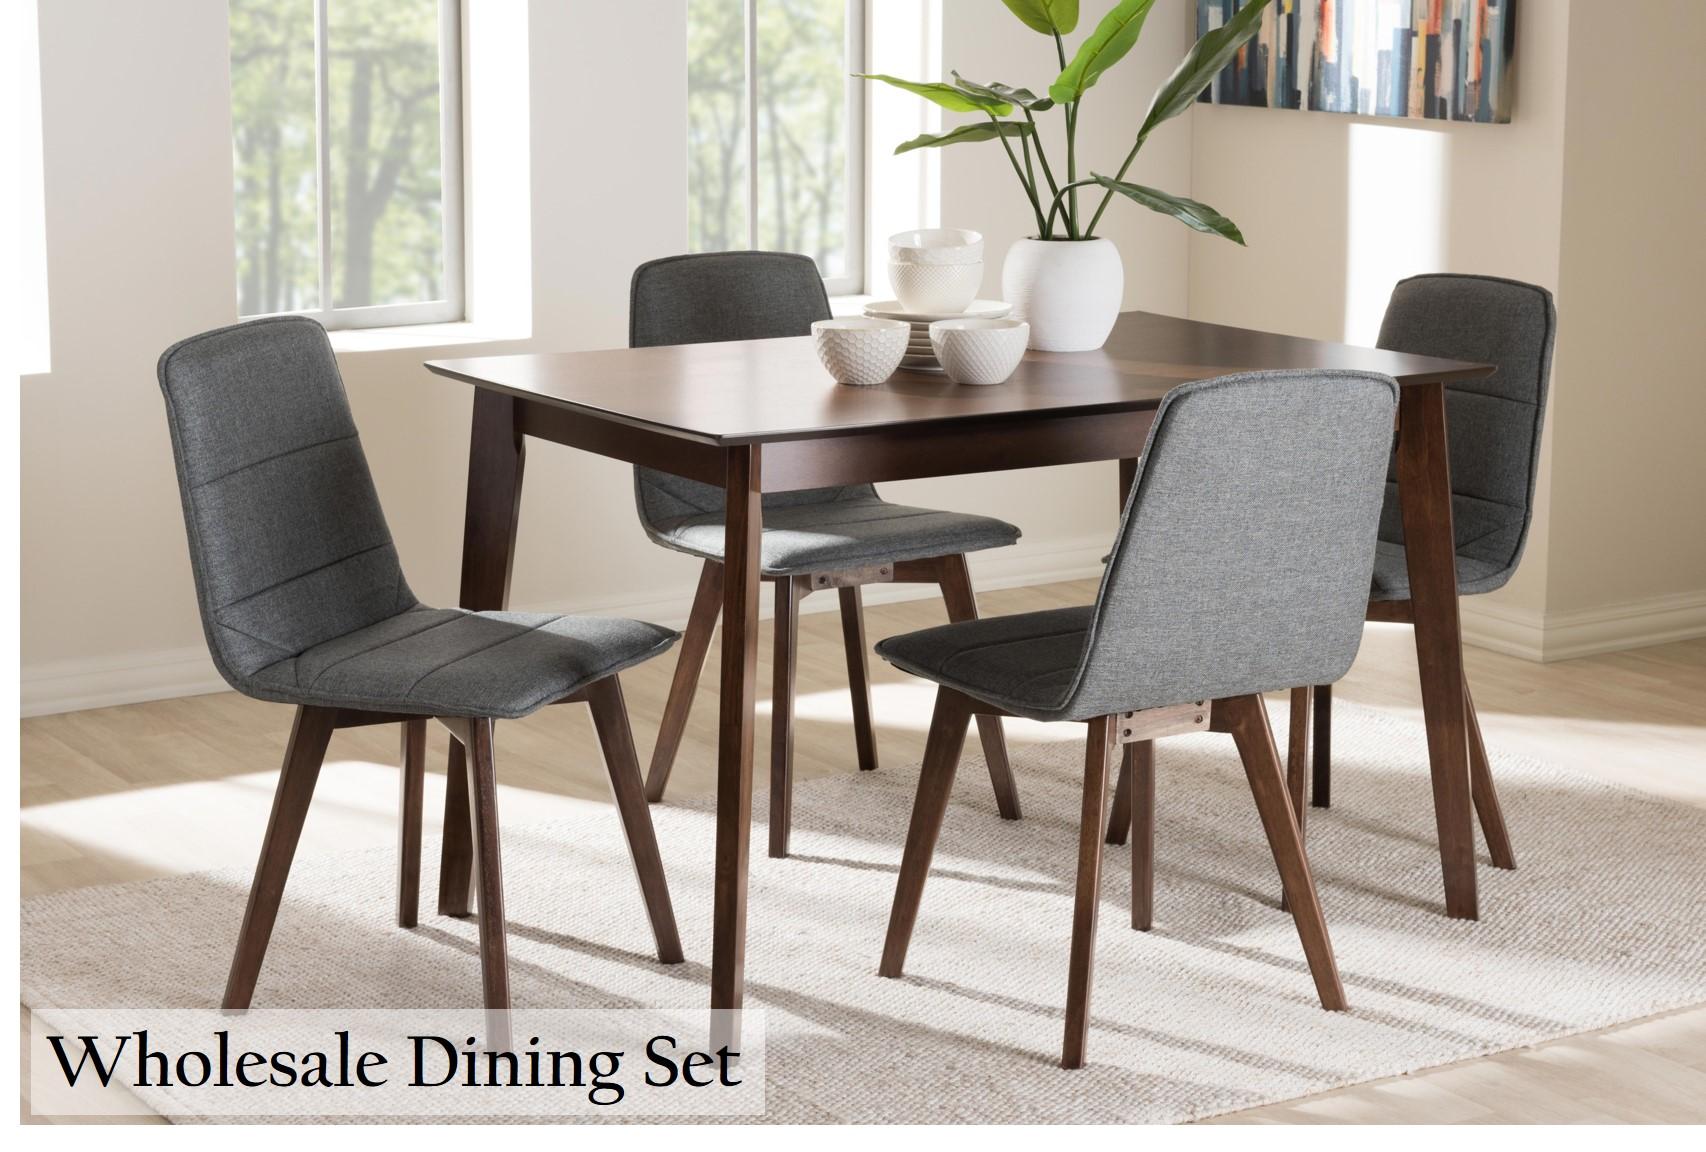 Wholesale Furniture Restaurant Furniture Commercial